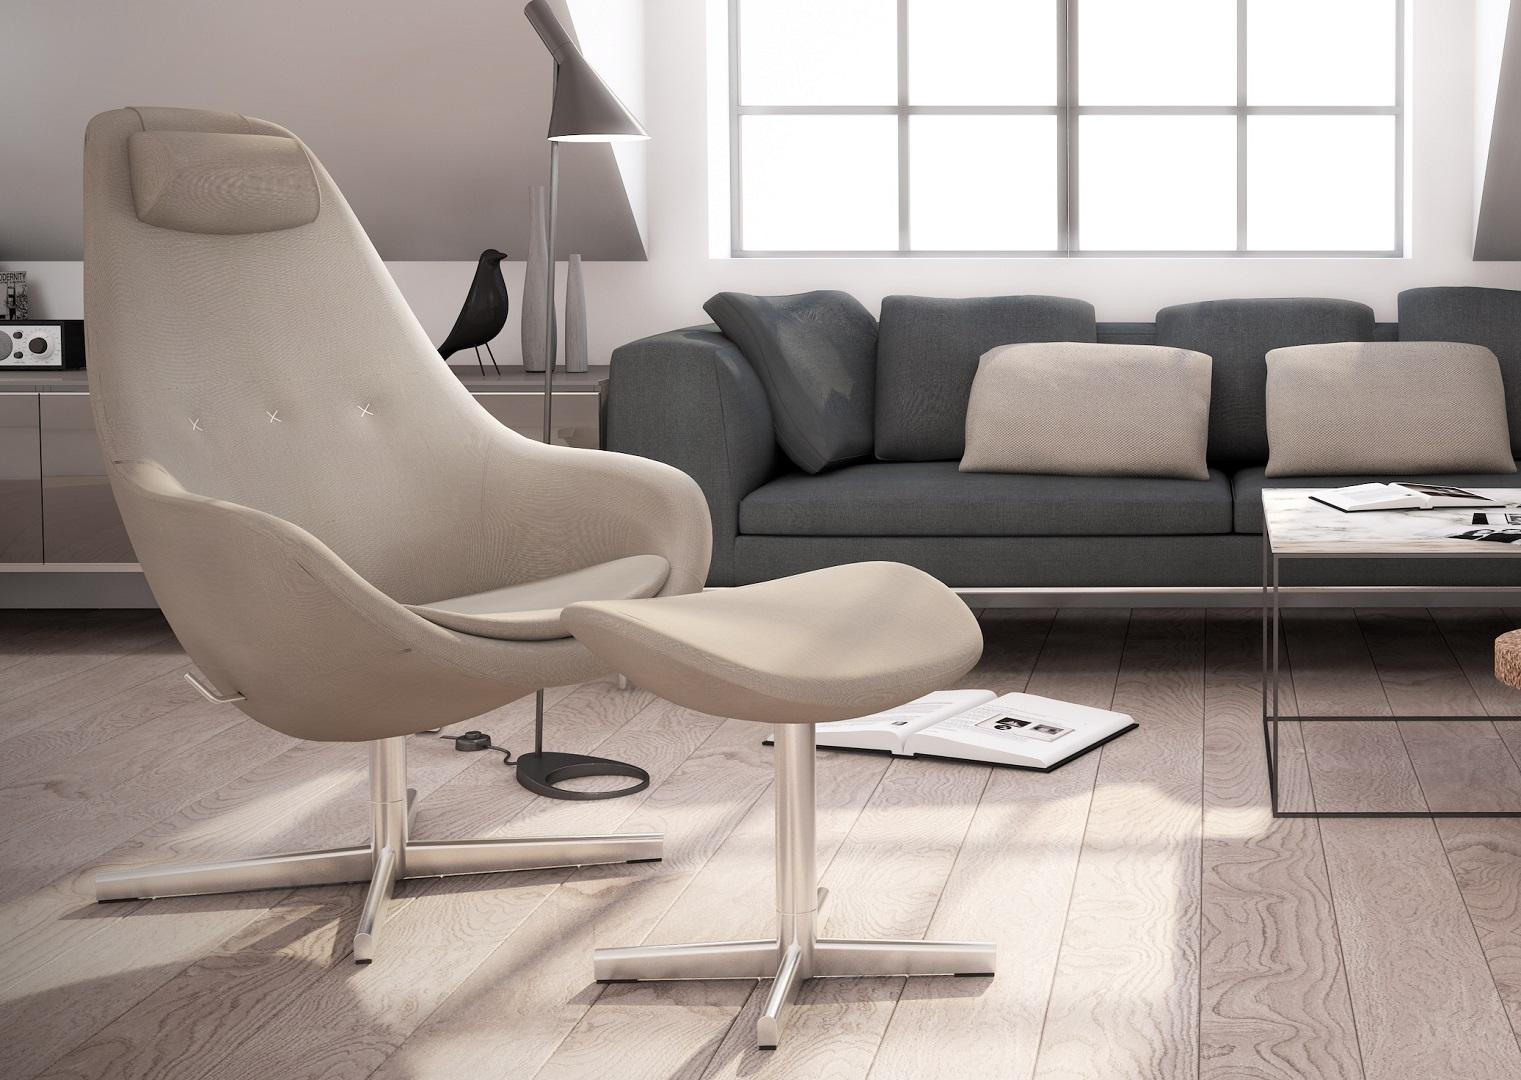 Varier Kokon & Footrest - Colori standard - Sedie ergonomiche